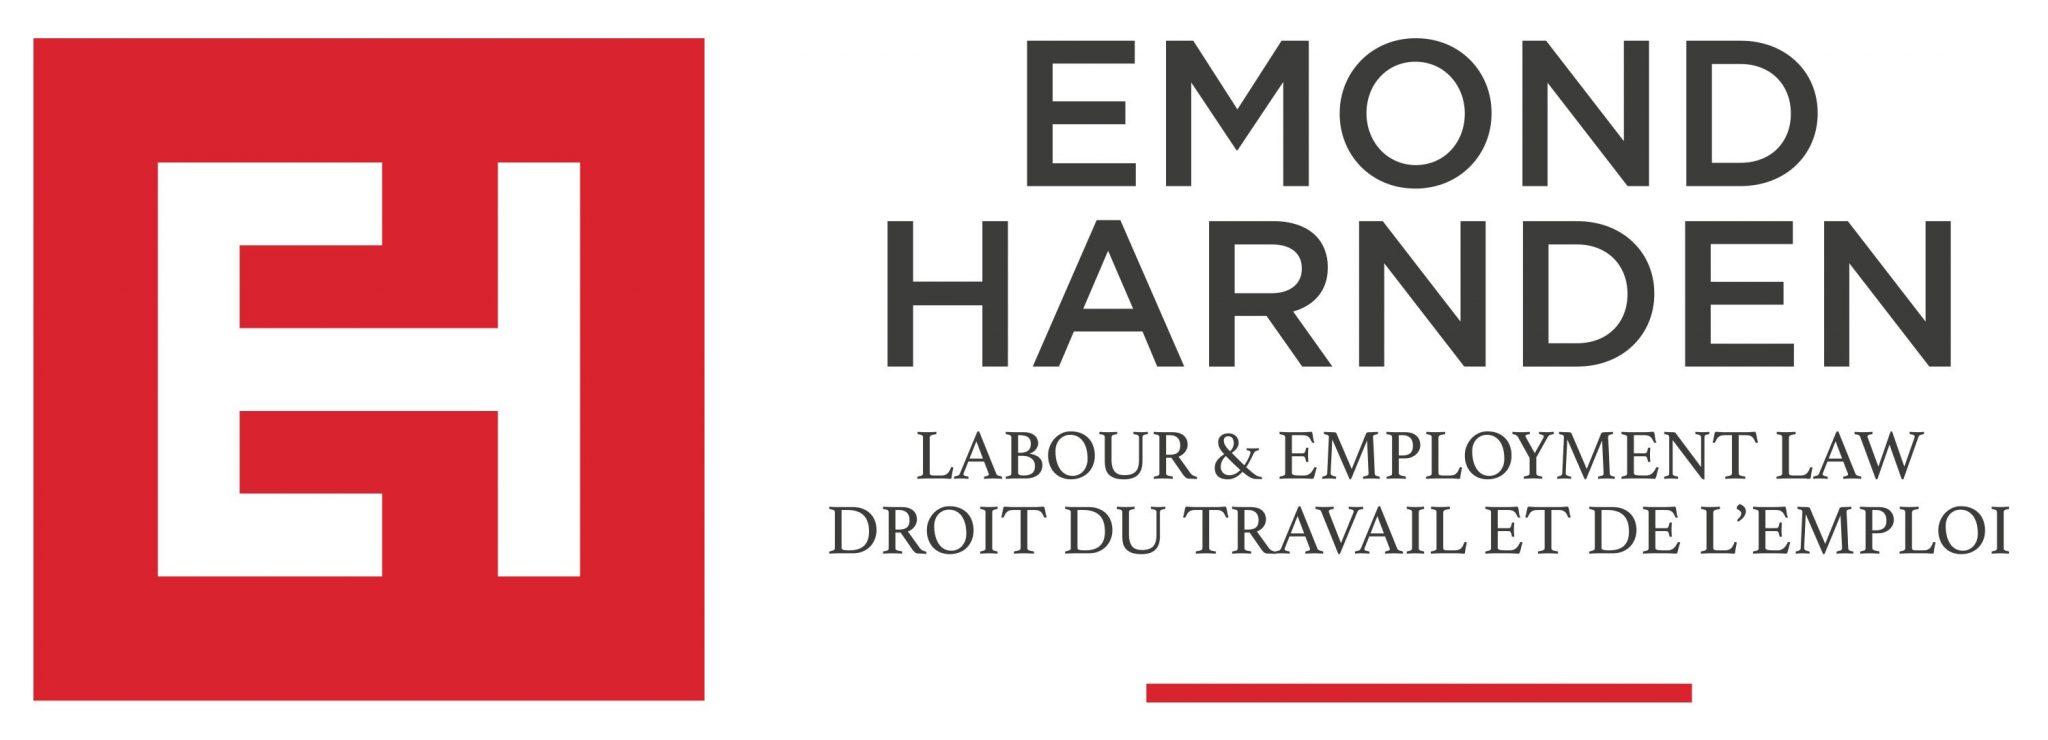 Emond Harnden logo